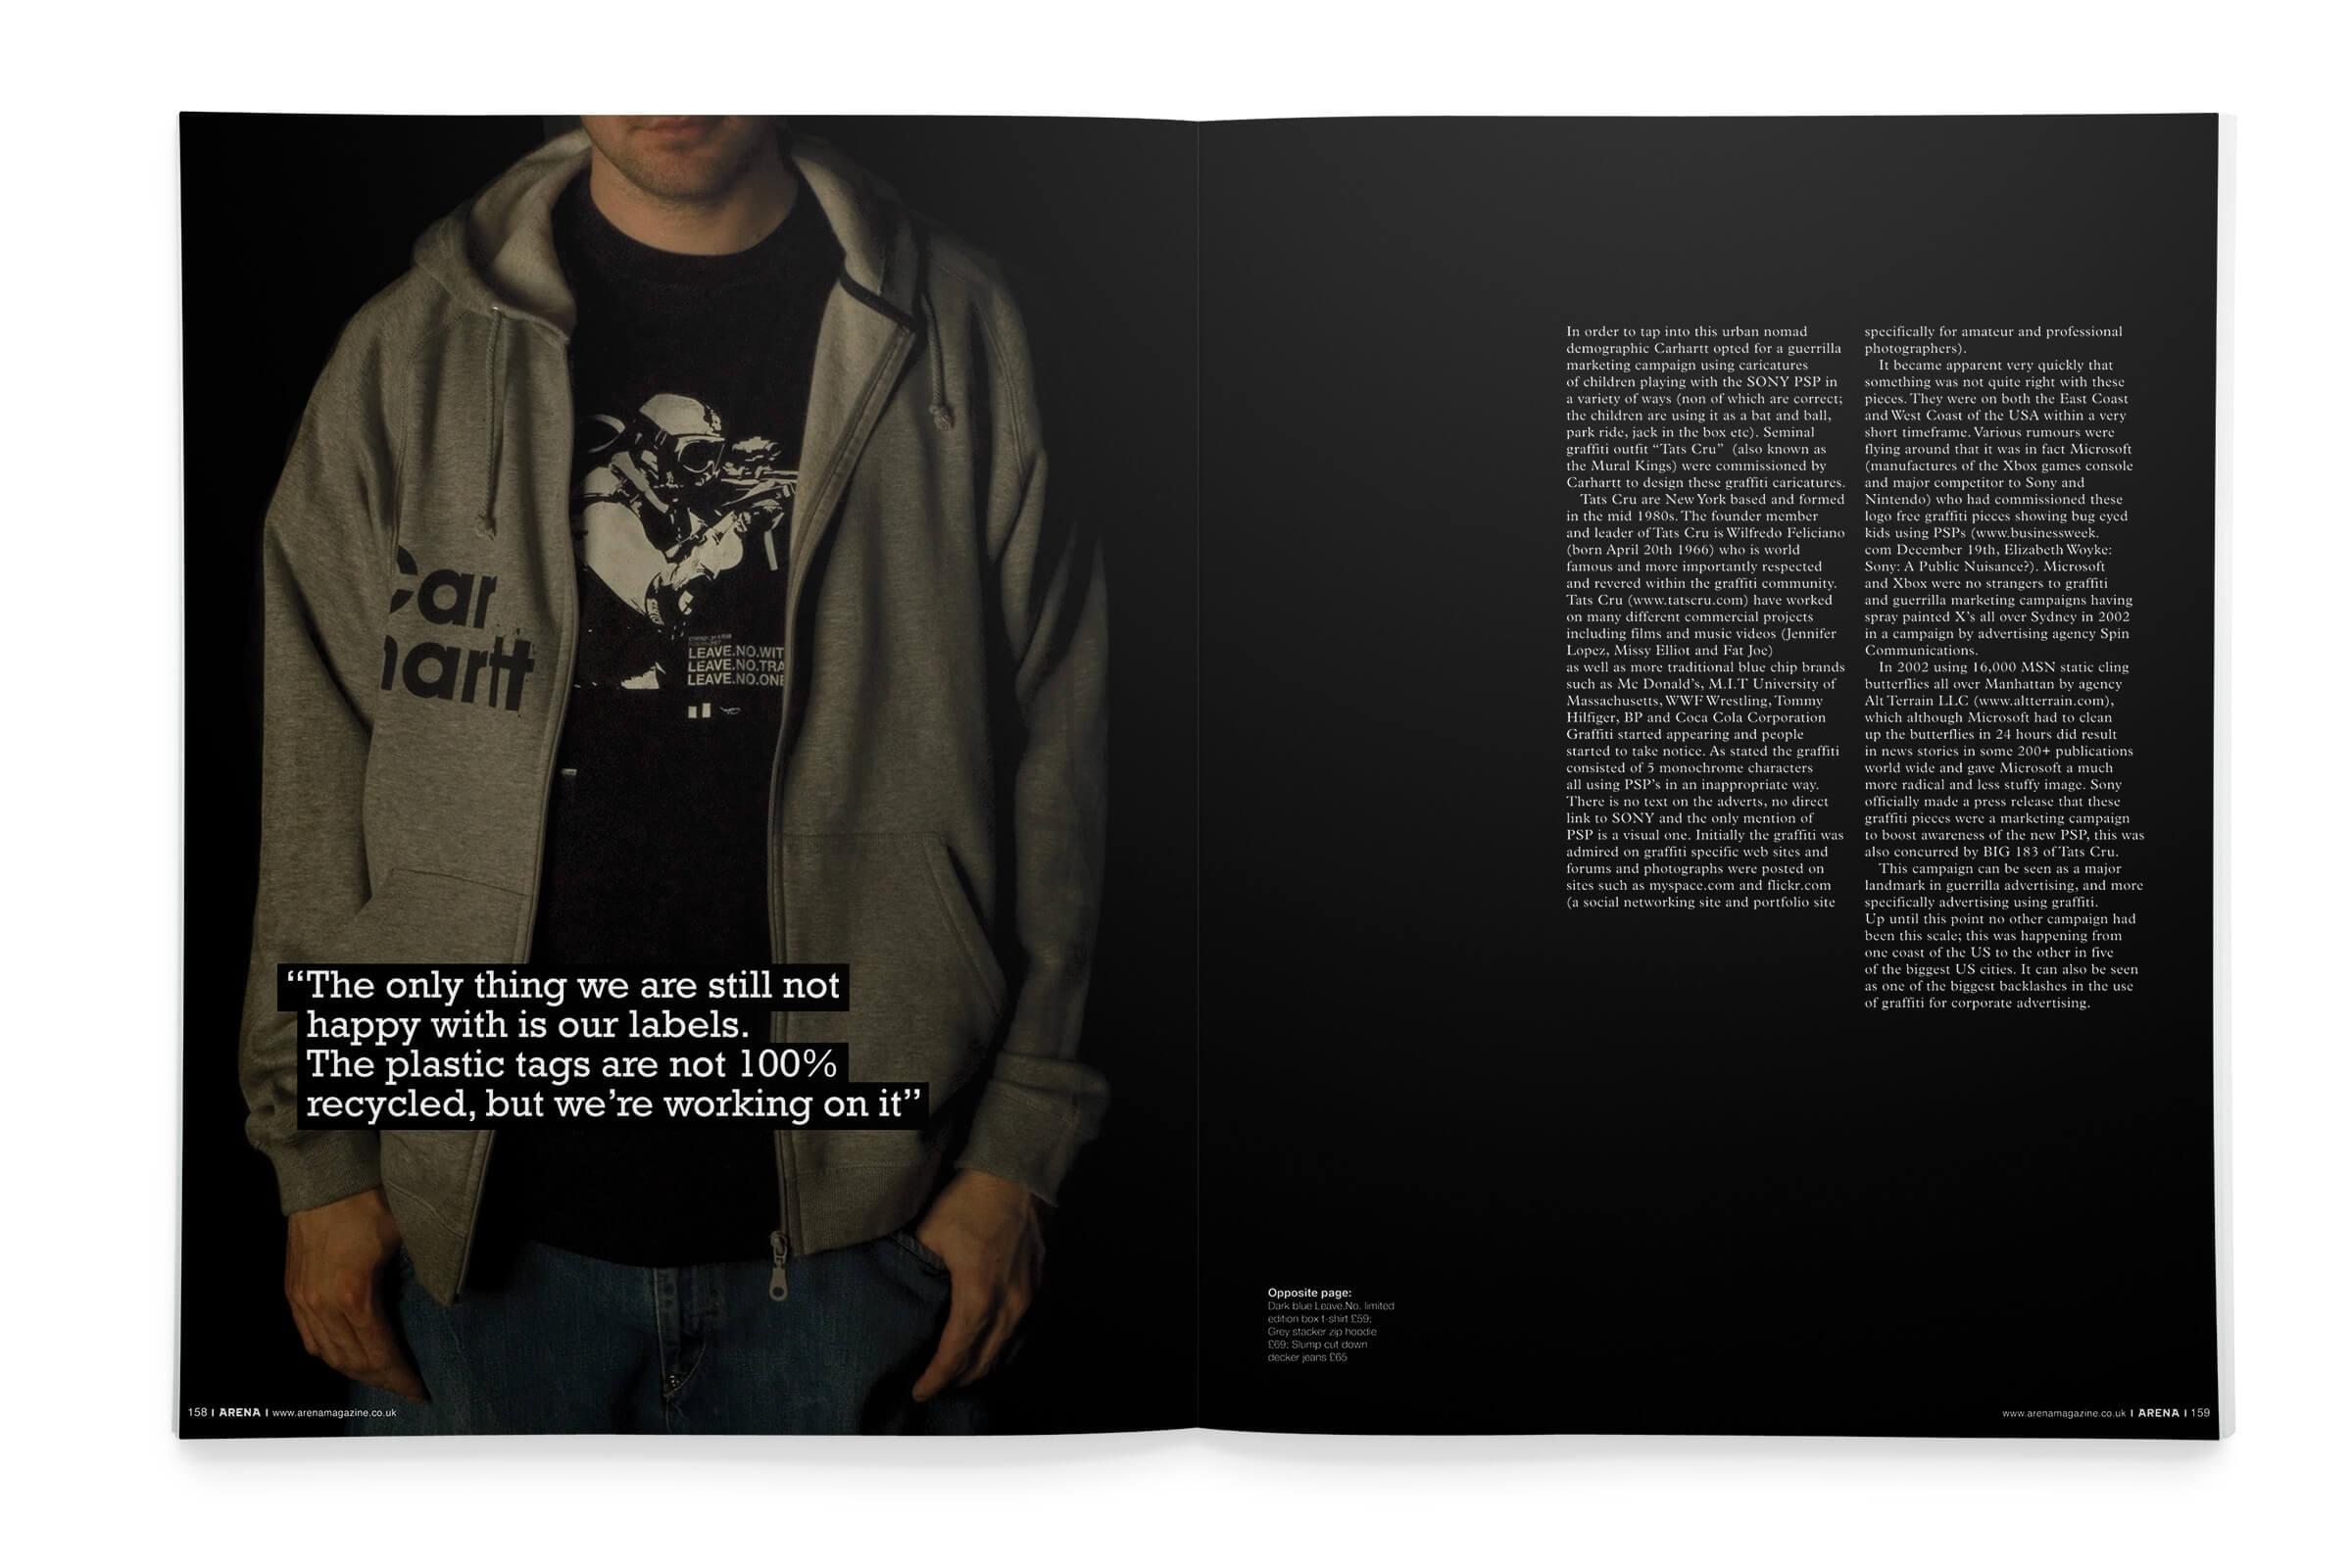 Arena Magazine-Carhartt spread 2